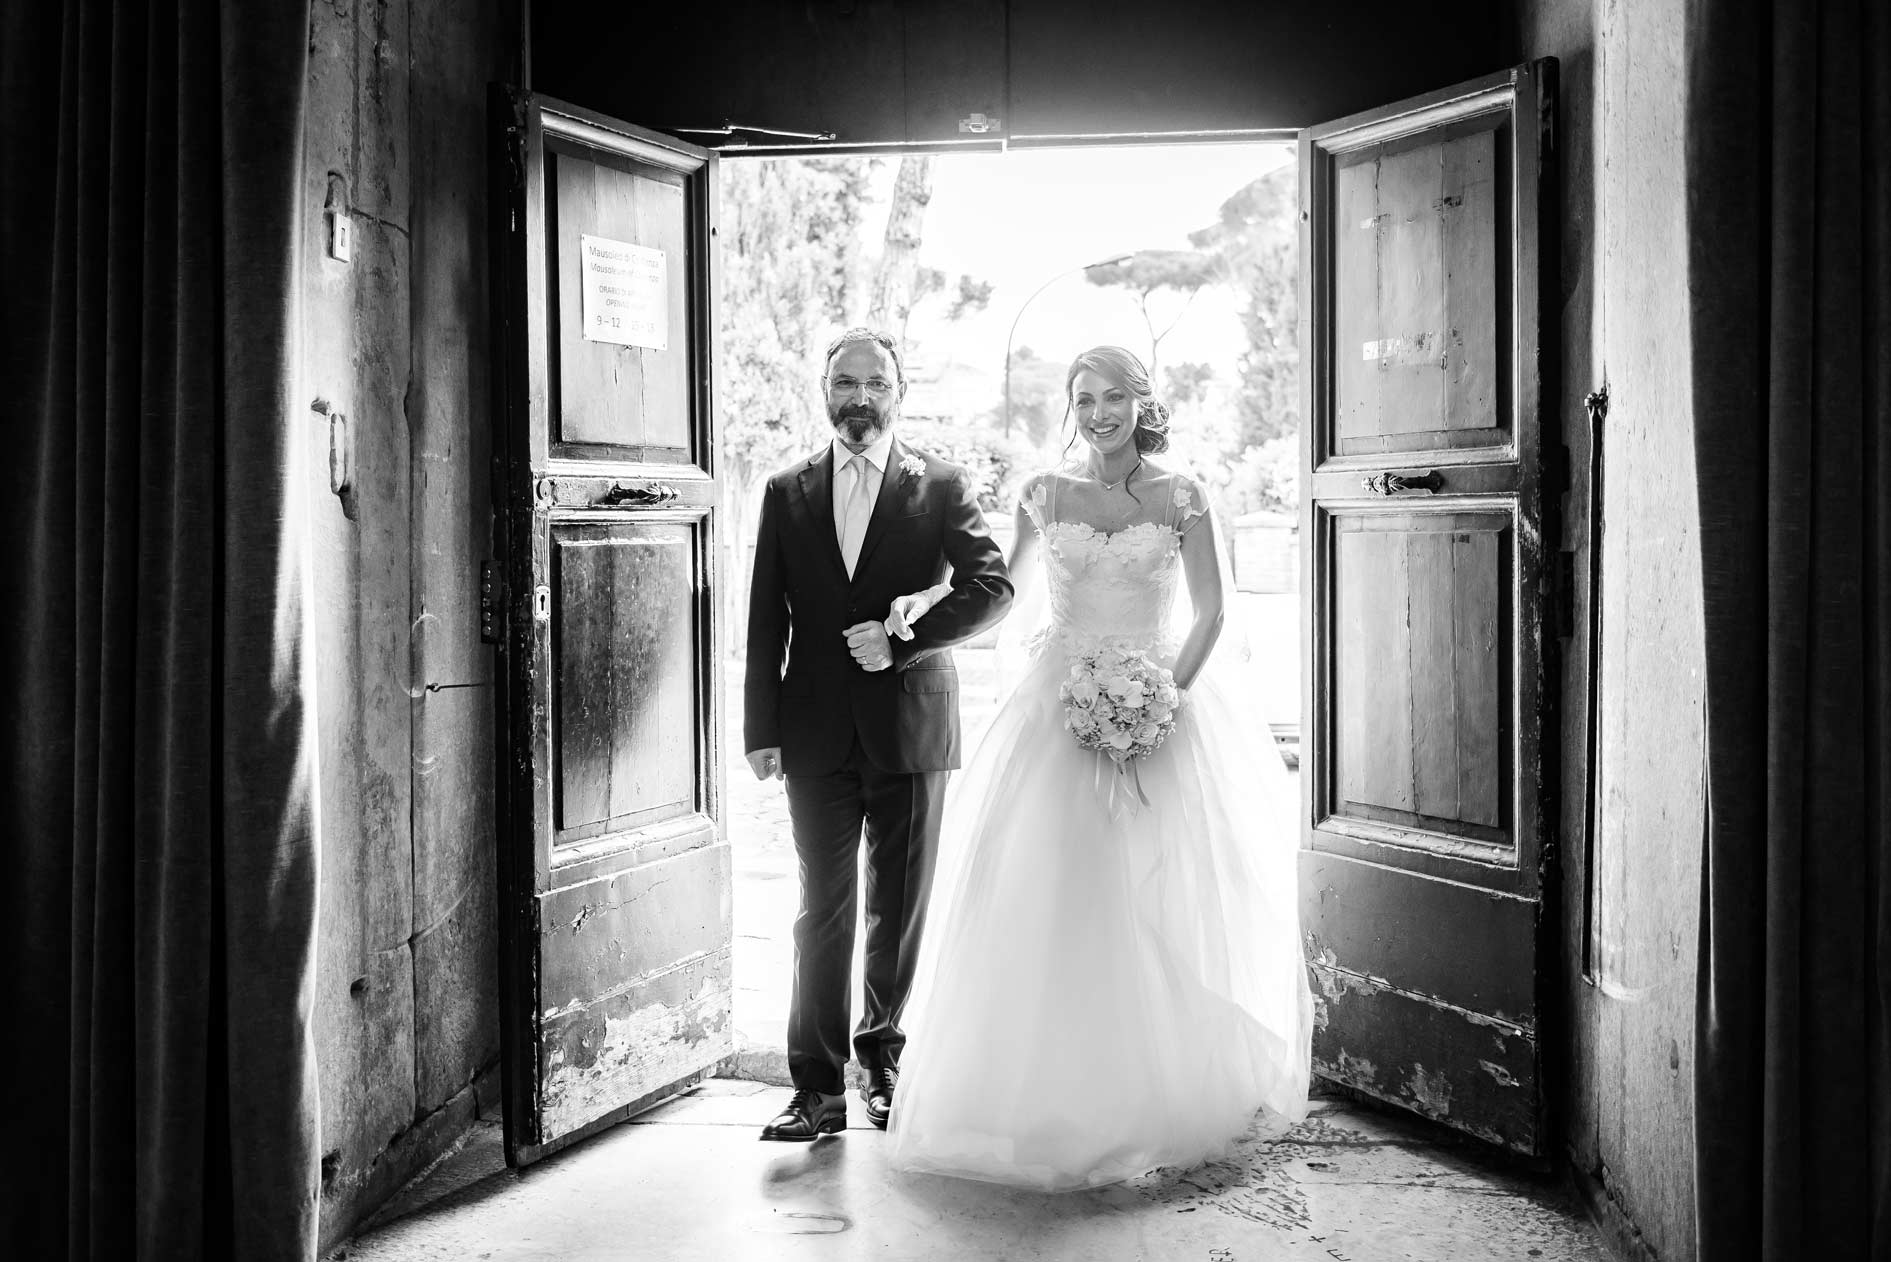 Destination-Wedding-Italy-Documentary-Wedding-Photography-2-Ceremony